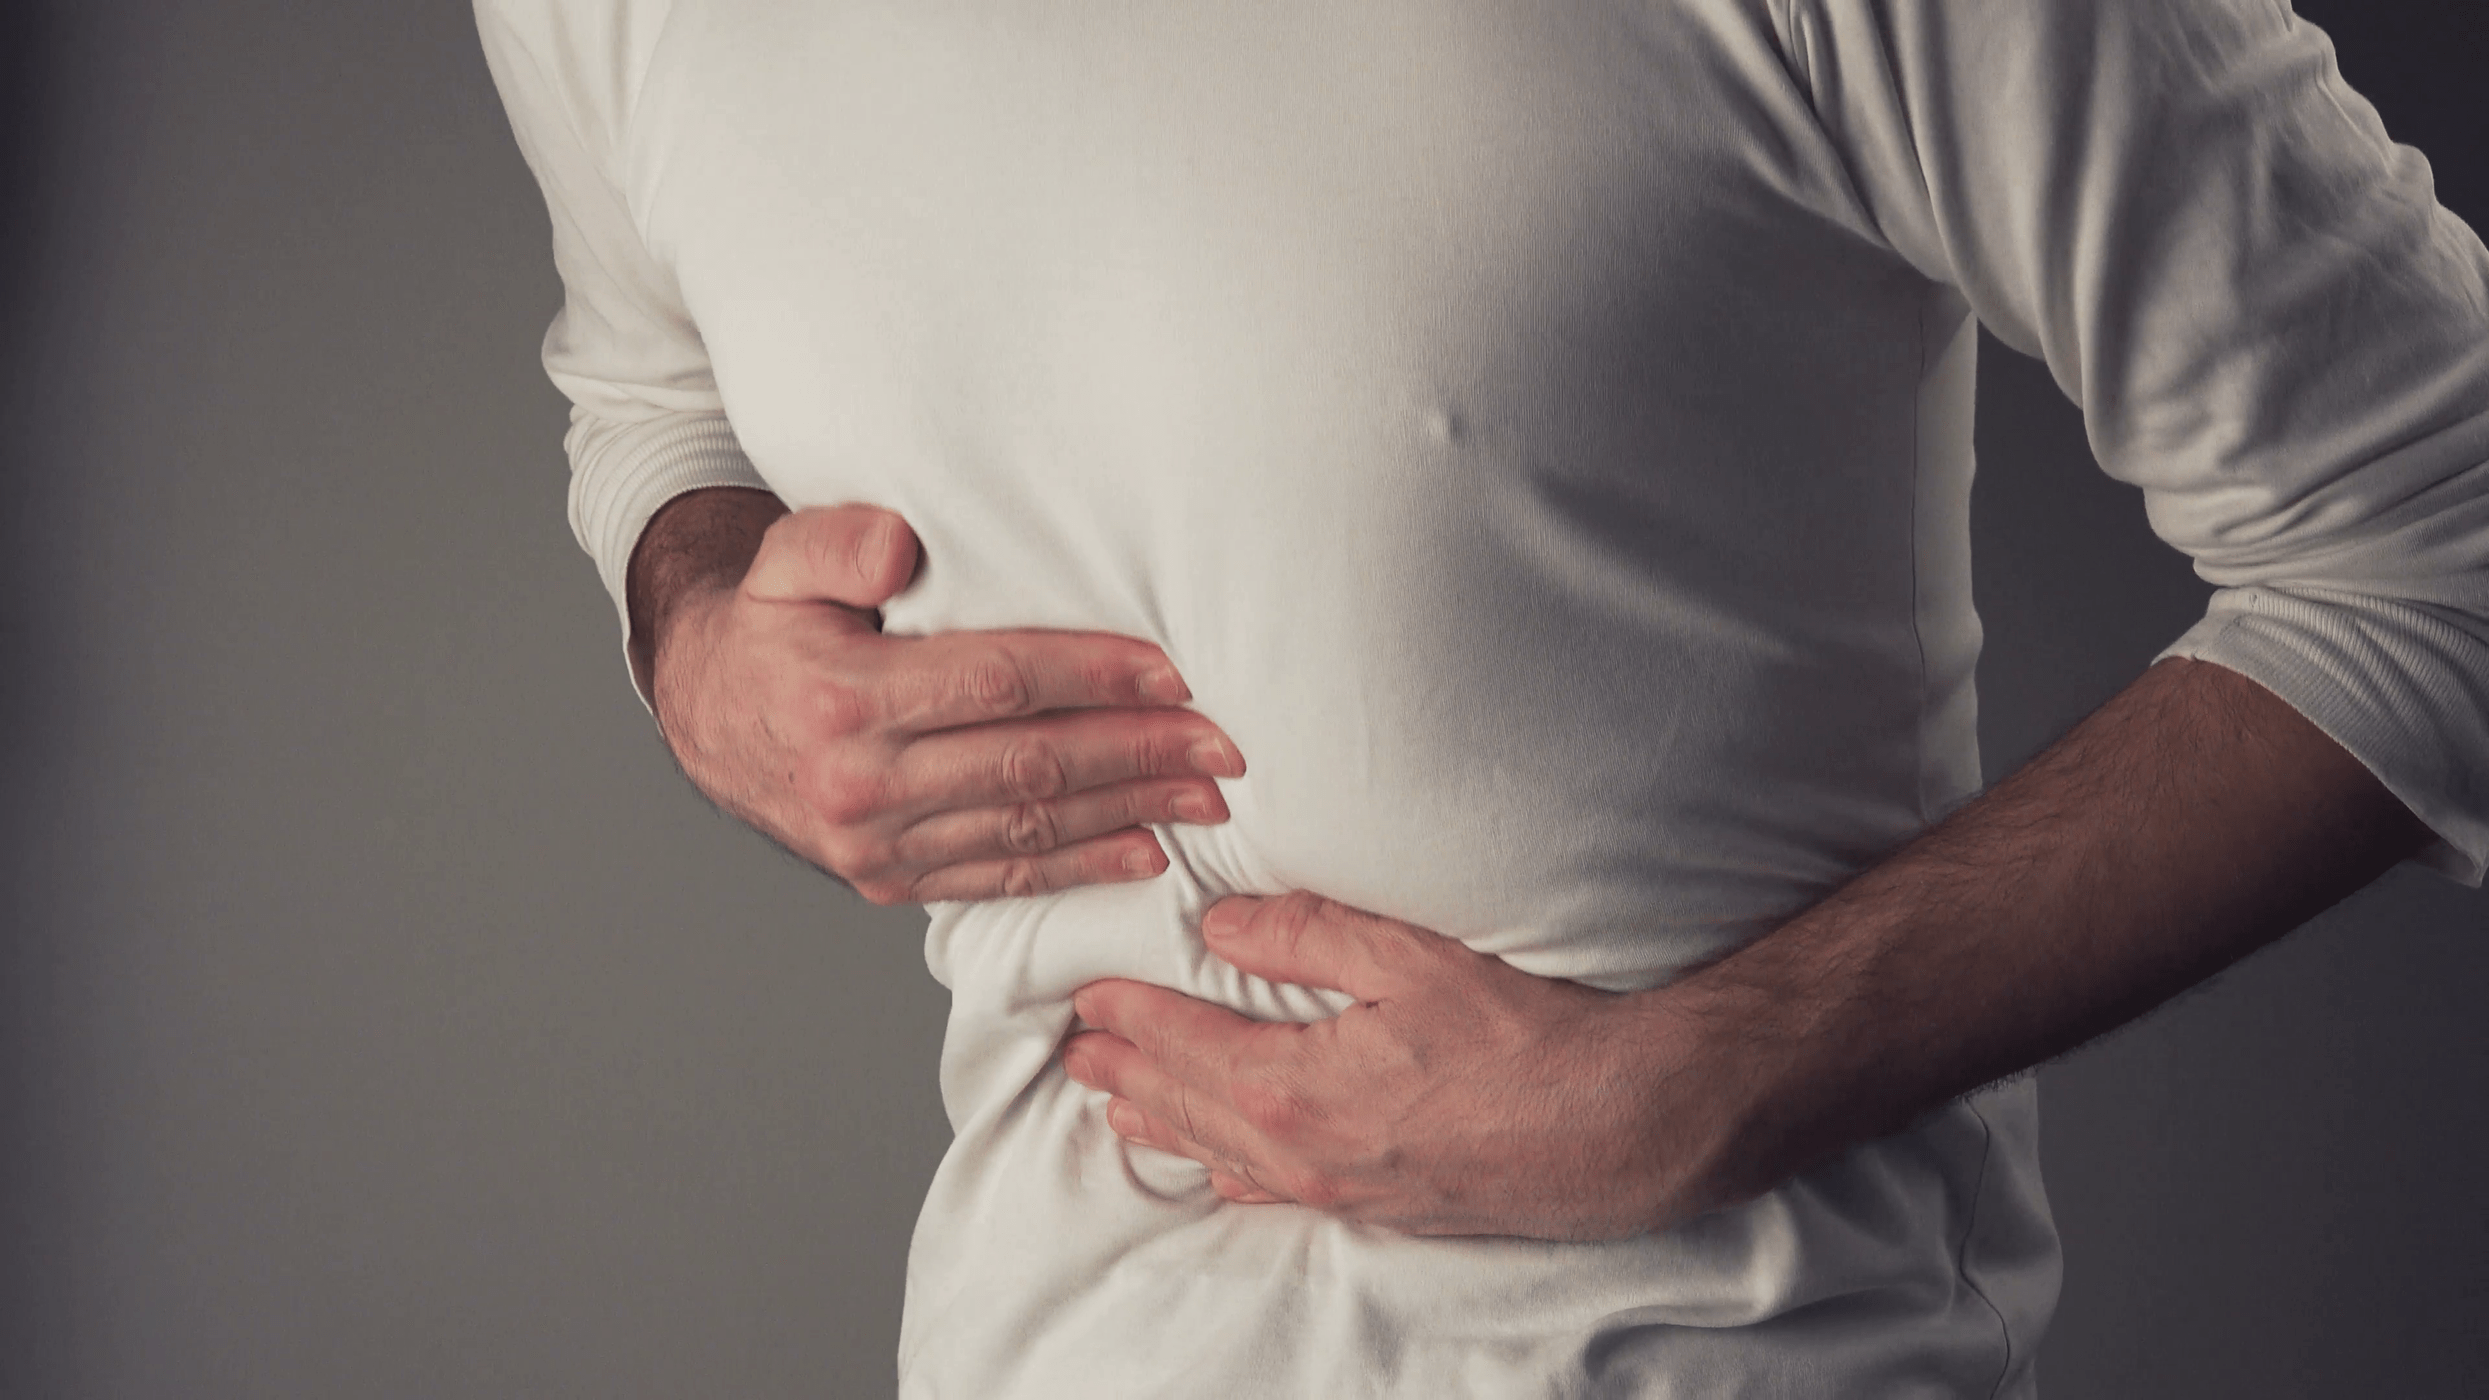 5 Cara Mencegah Datangnya Maag Saat Lagi Berpuasa 3